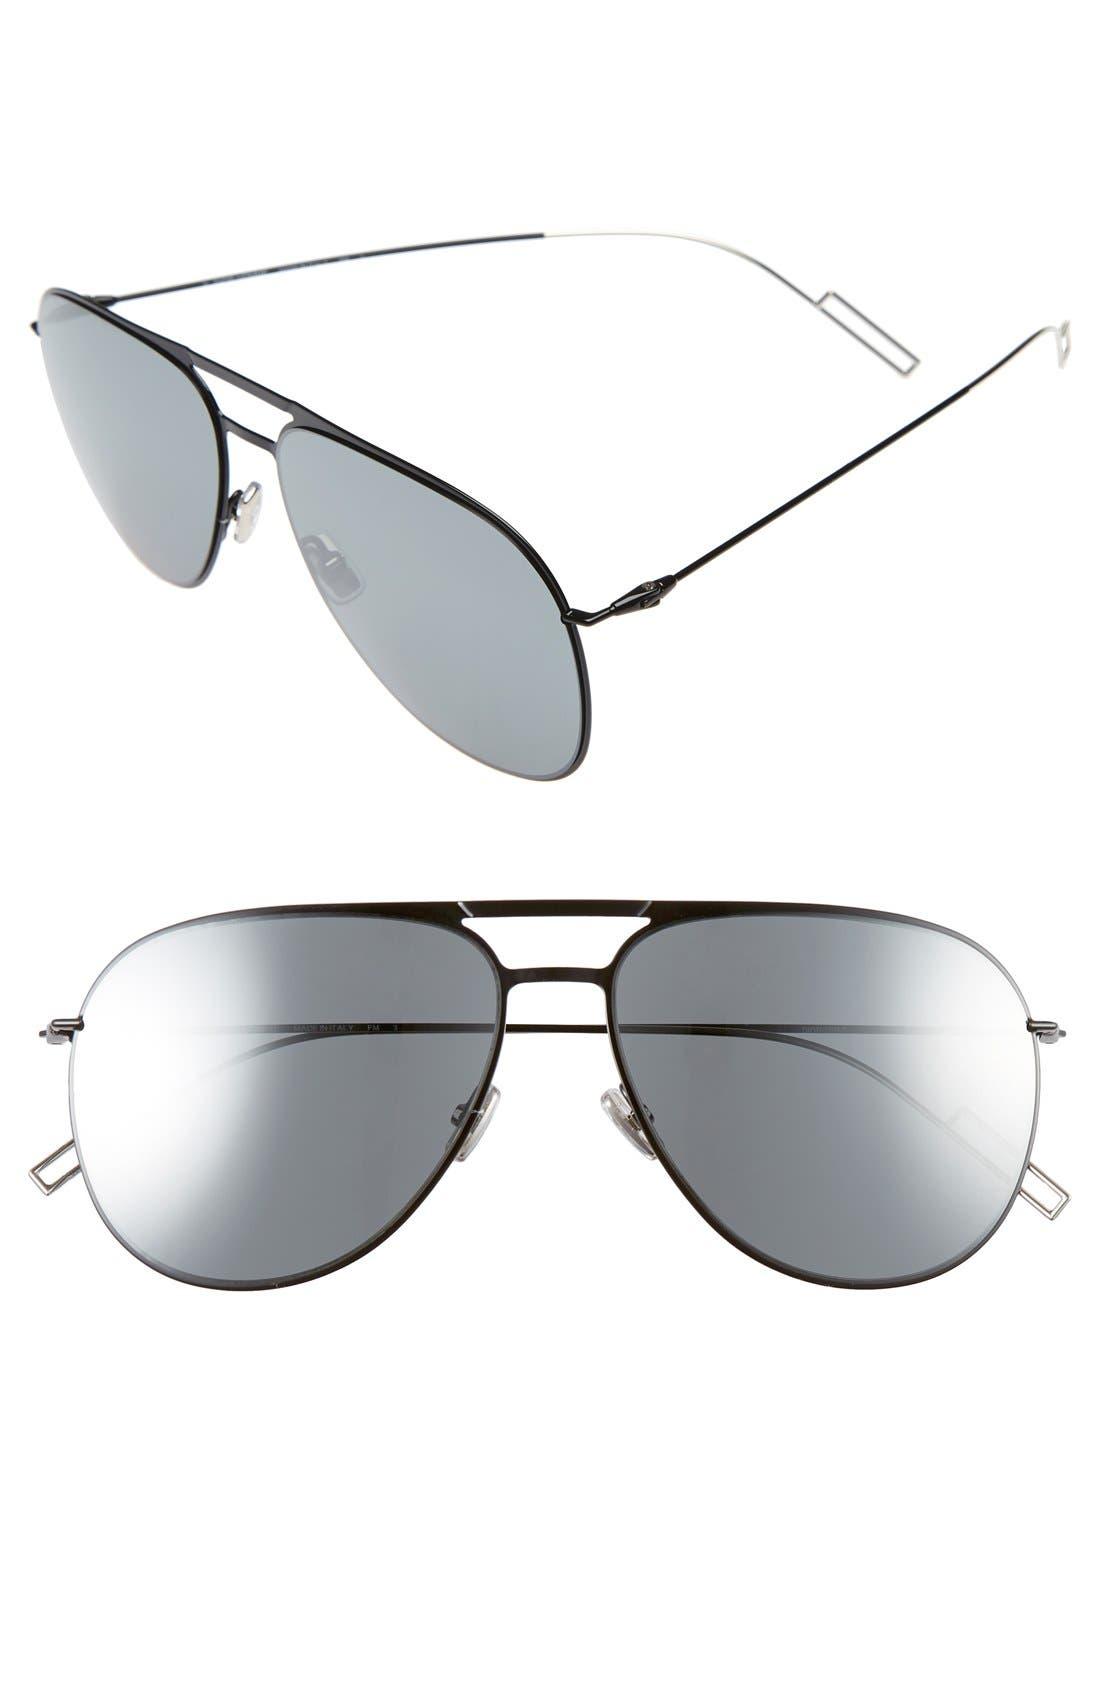 59mm Aviator Sunglasses,                             Main thumbnail 1, color,                             SHINY BLACK